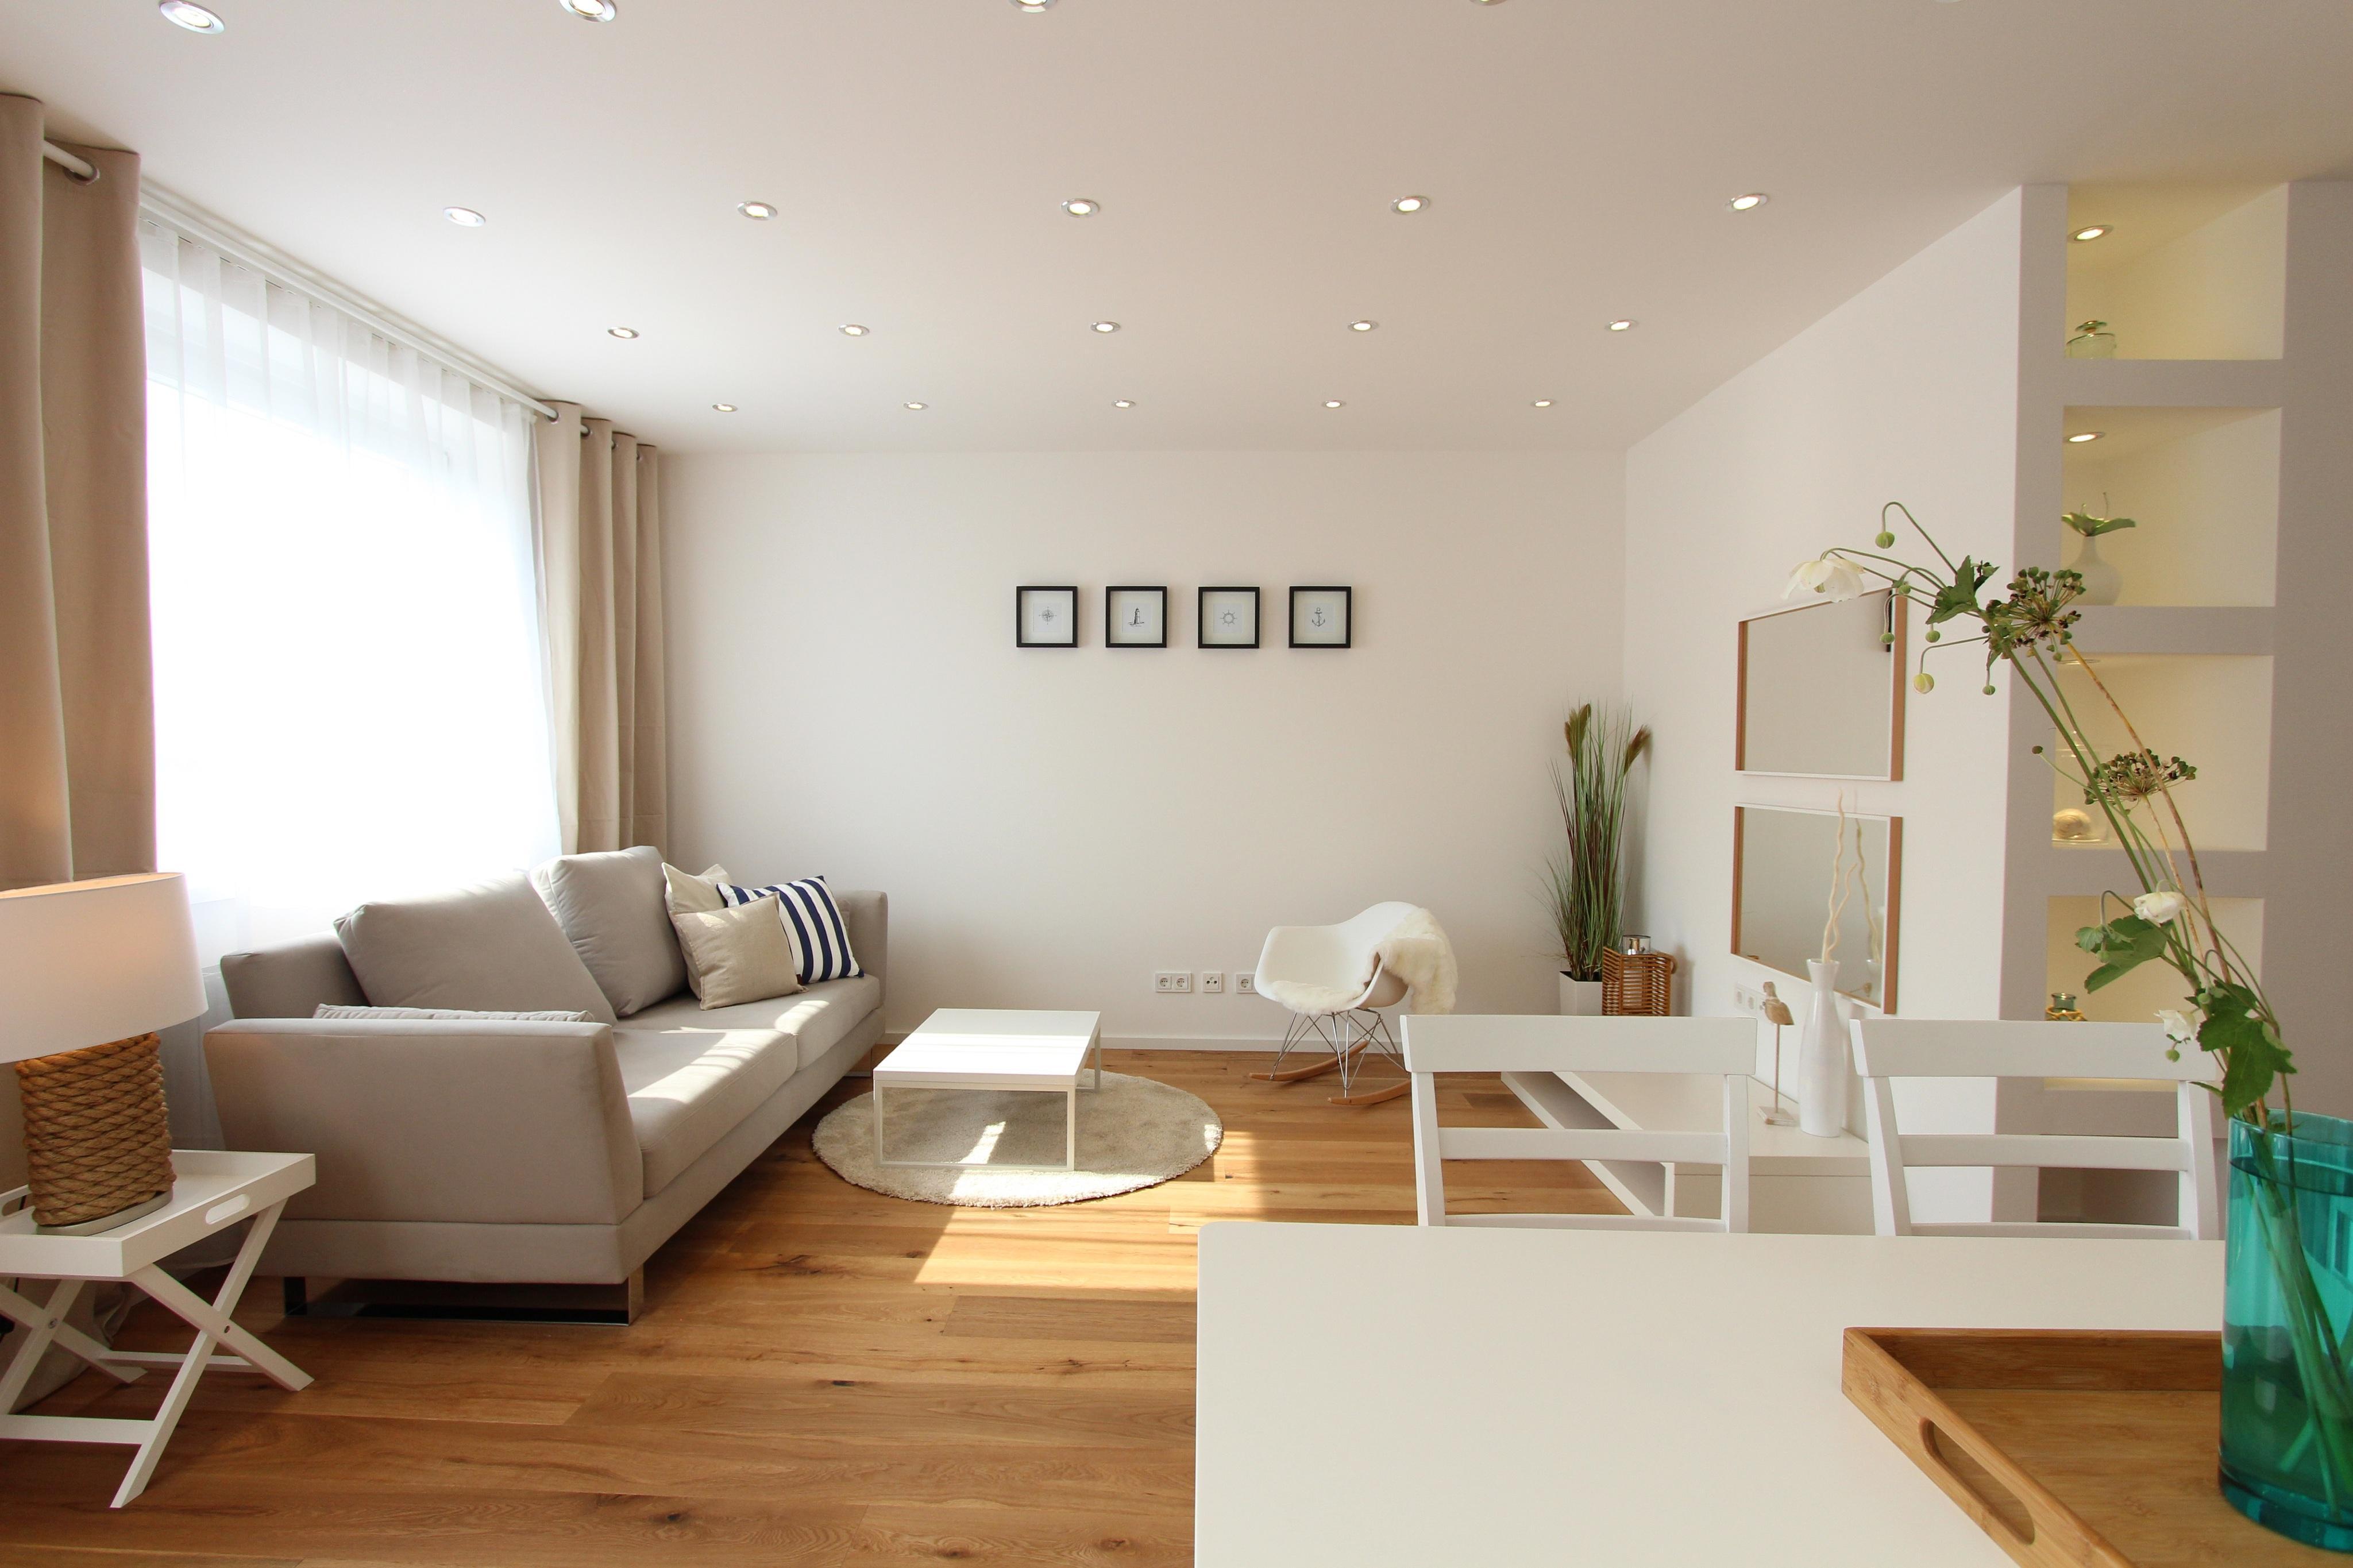 Fantastisch Hamptons Light #wohnzimmer #maisonette #schaukelstuhl #landhausstil ©Hemmer  Isabella